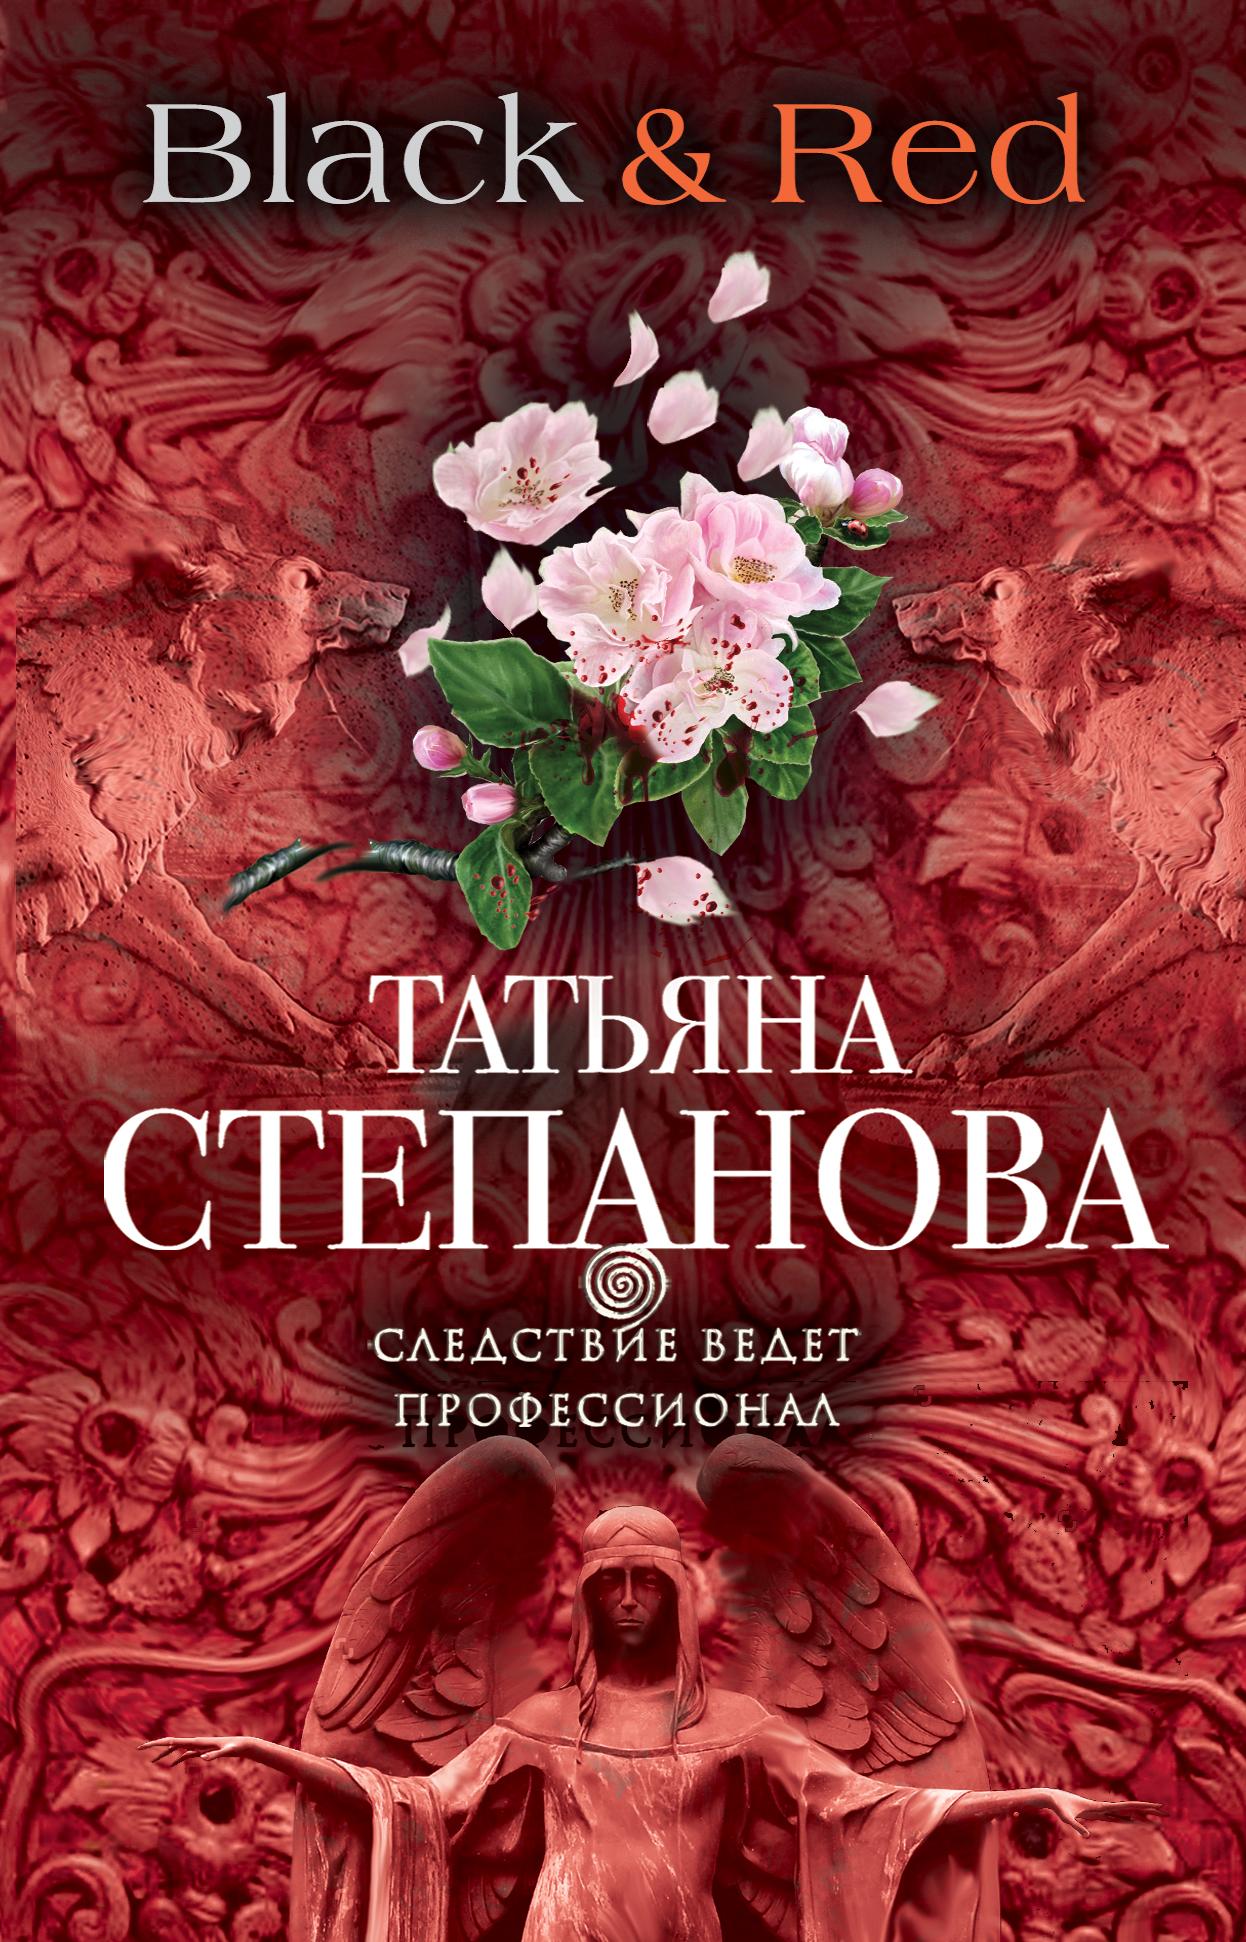 Татьяна Степанова Black & Red